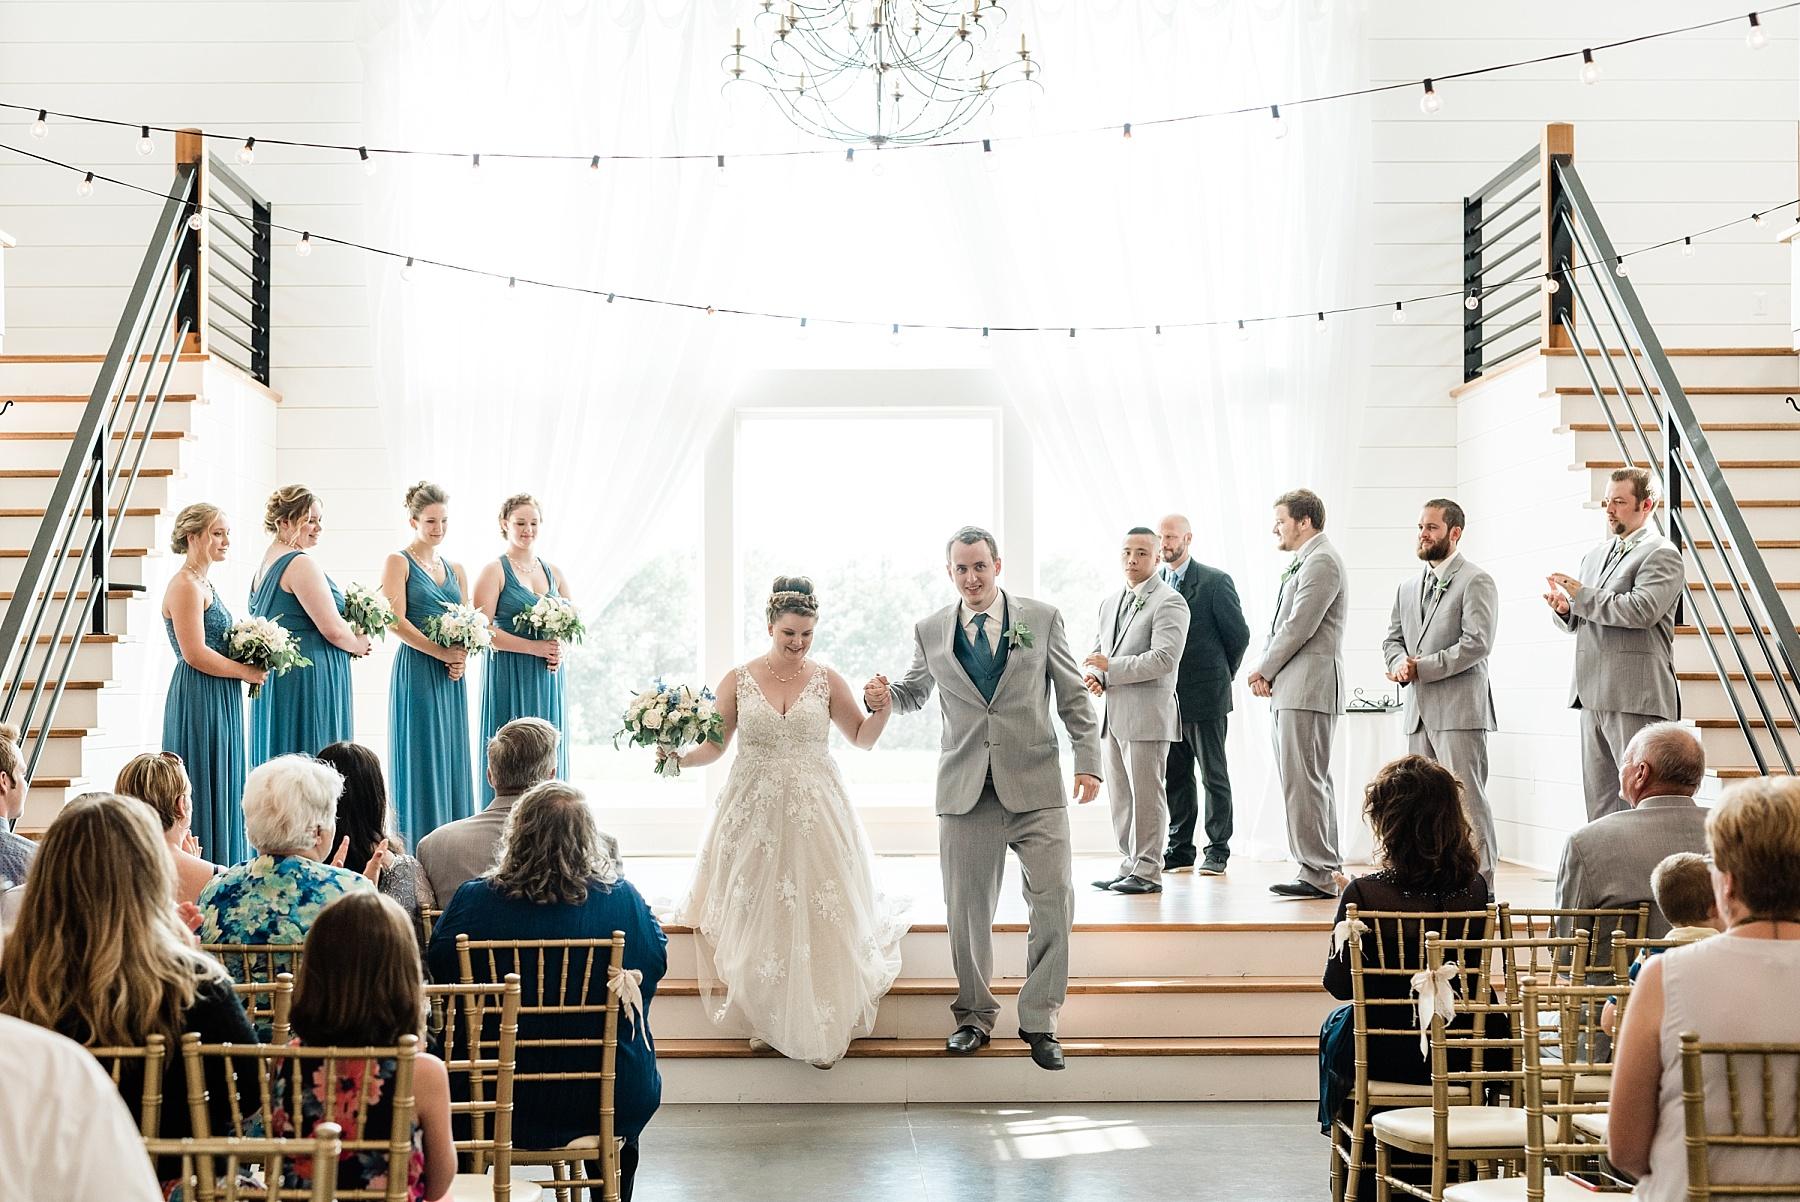 Intimate Summer Wedding at Emerson Fields by Kelsi Kliethermes Photography Best Missouri and Maui Wedding Photographer_0005.jpg